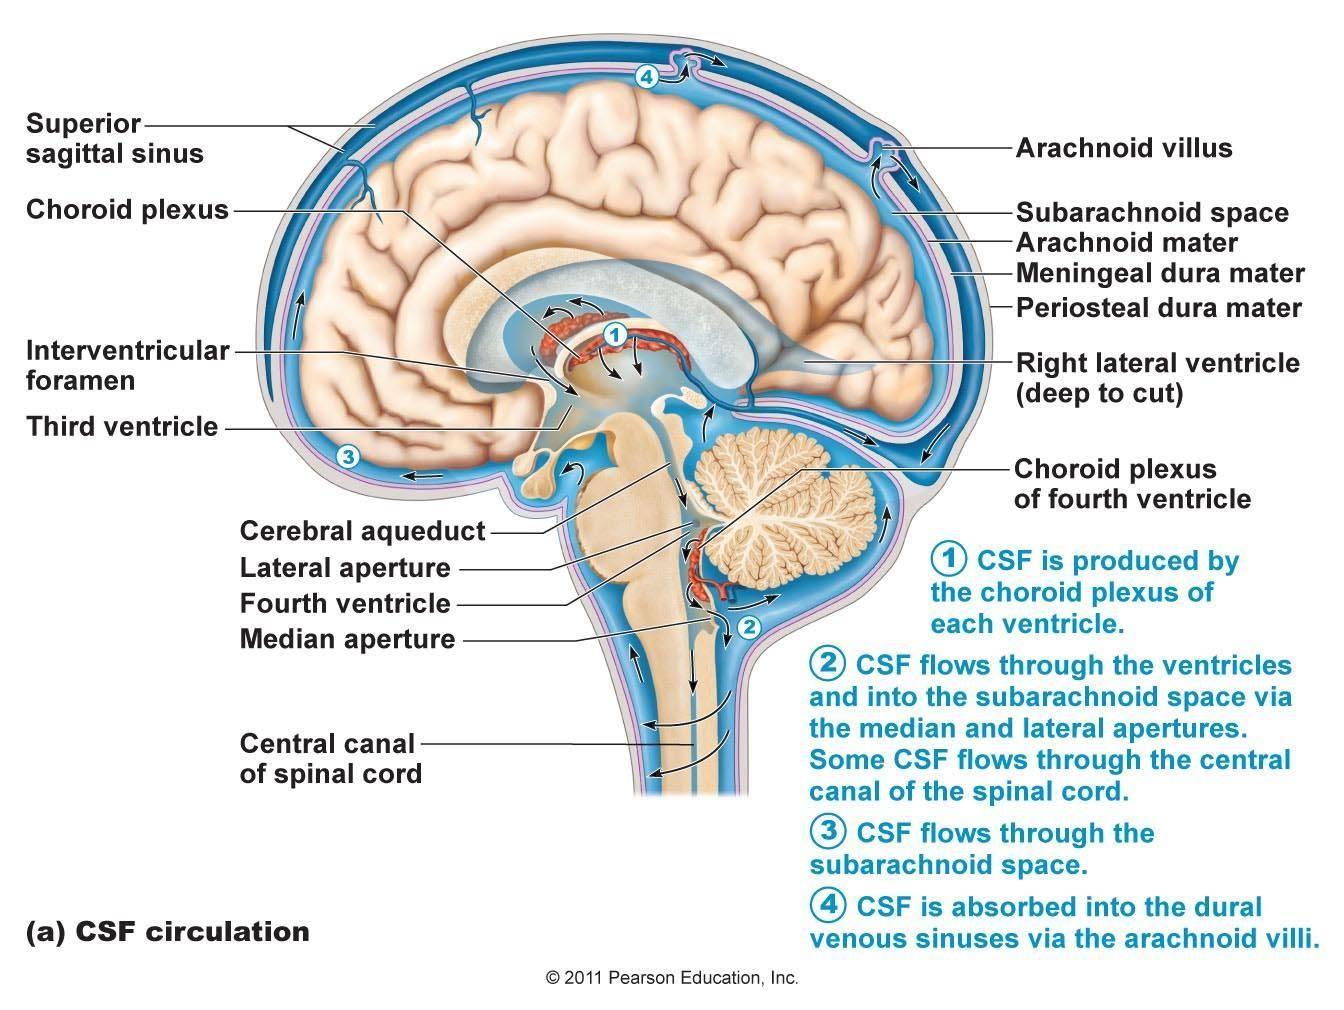 brain liquor circulation cisternae - Google Search | MedMed ...